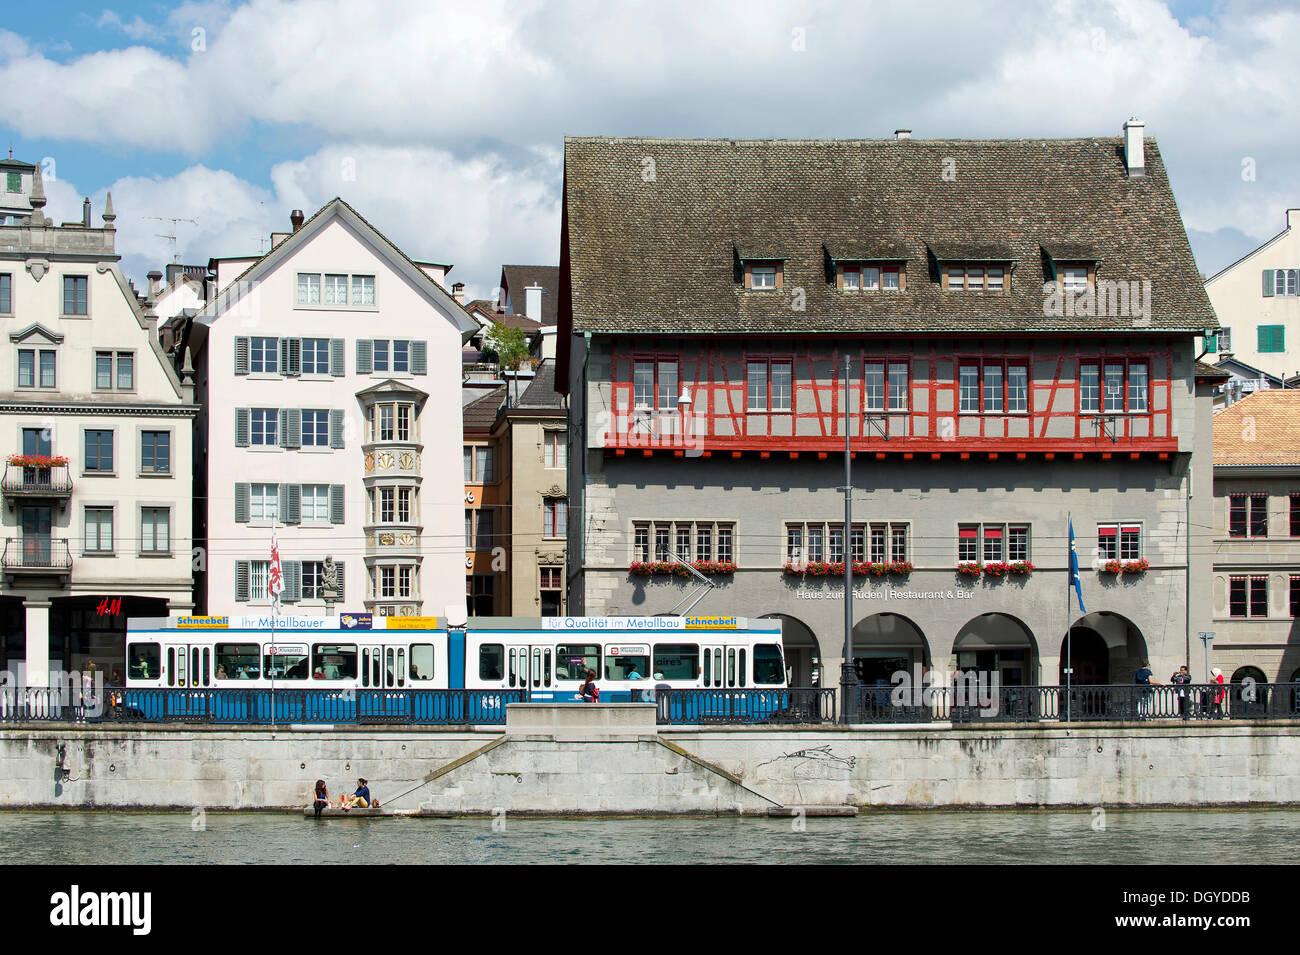 Tram, Limmat river, Limmatquai with the guild house 'Zum Rueden', old town of Zurich, Canton of Zurich, - Stock Image